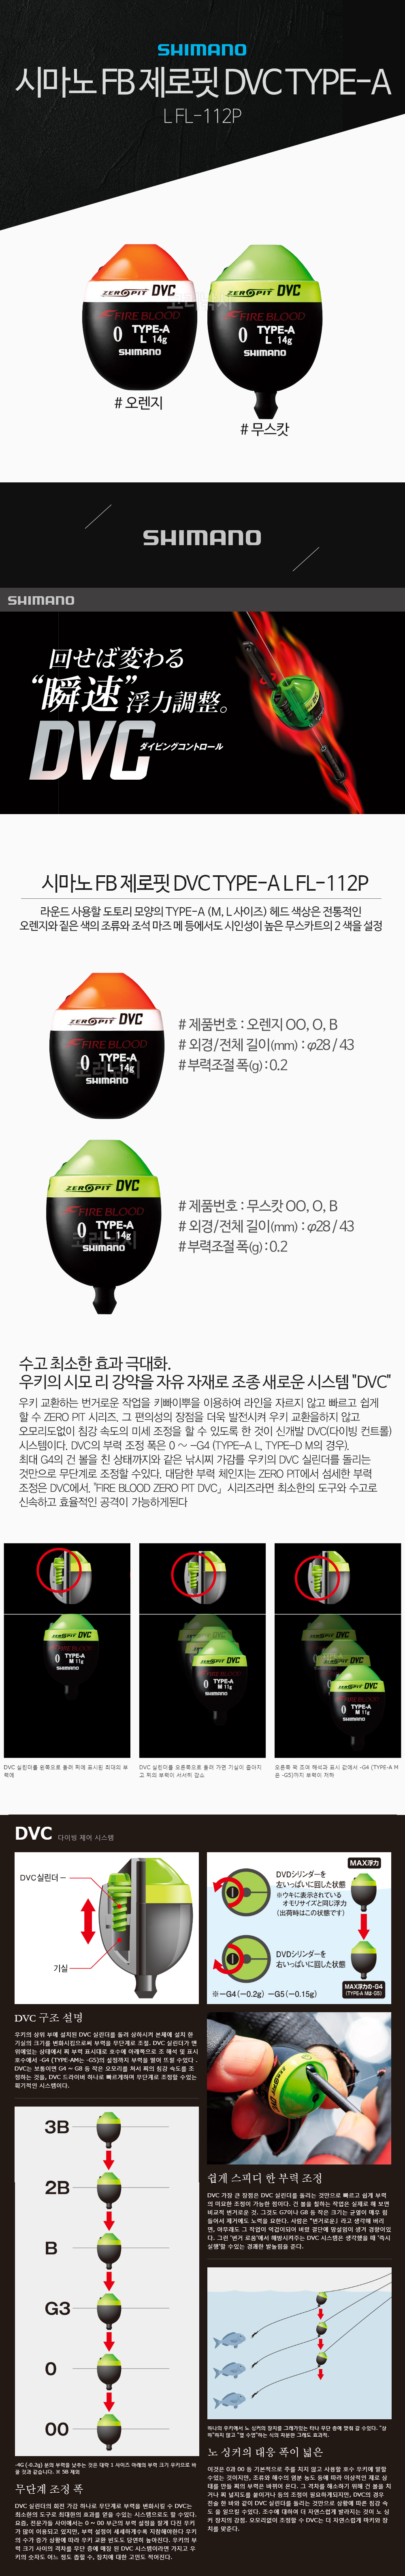 시마노 FB 제로핏 DVC TYPE-A L FL-112P 파이어블러드찌 zero pit DVC 시마노구멍찌 부력조절구멍찌